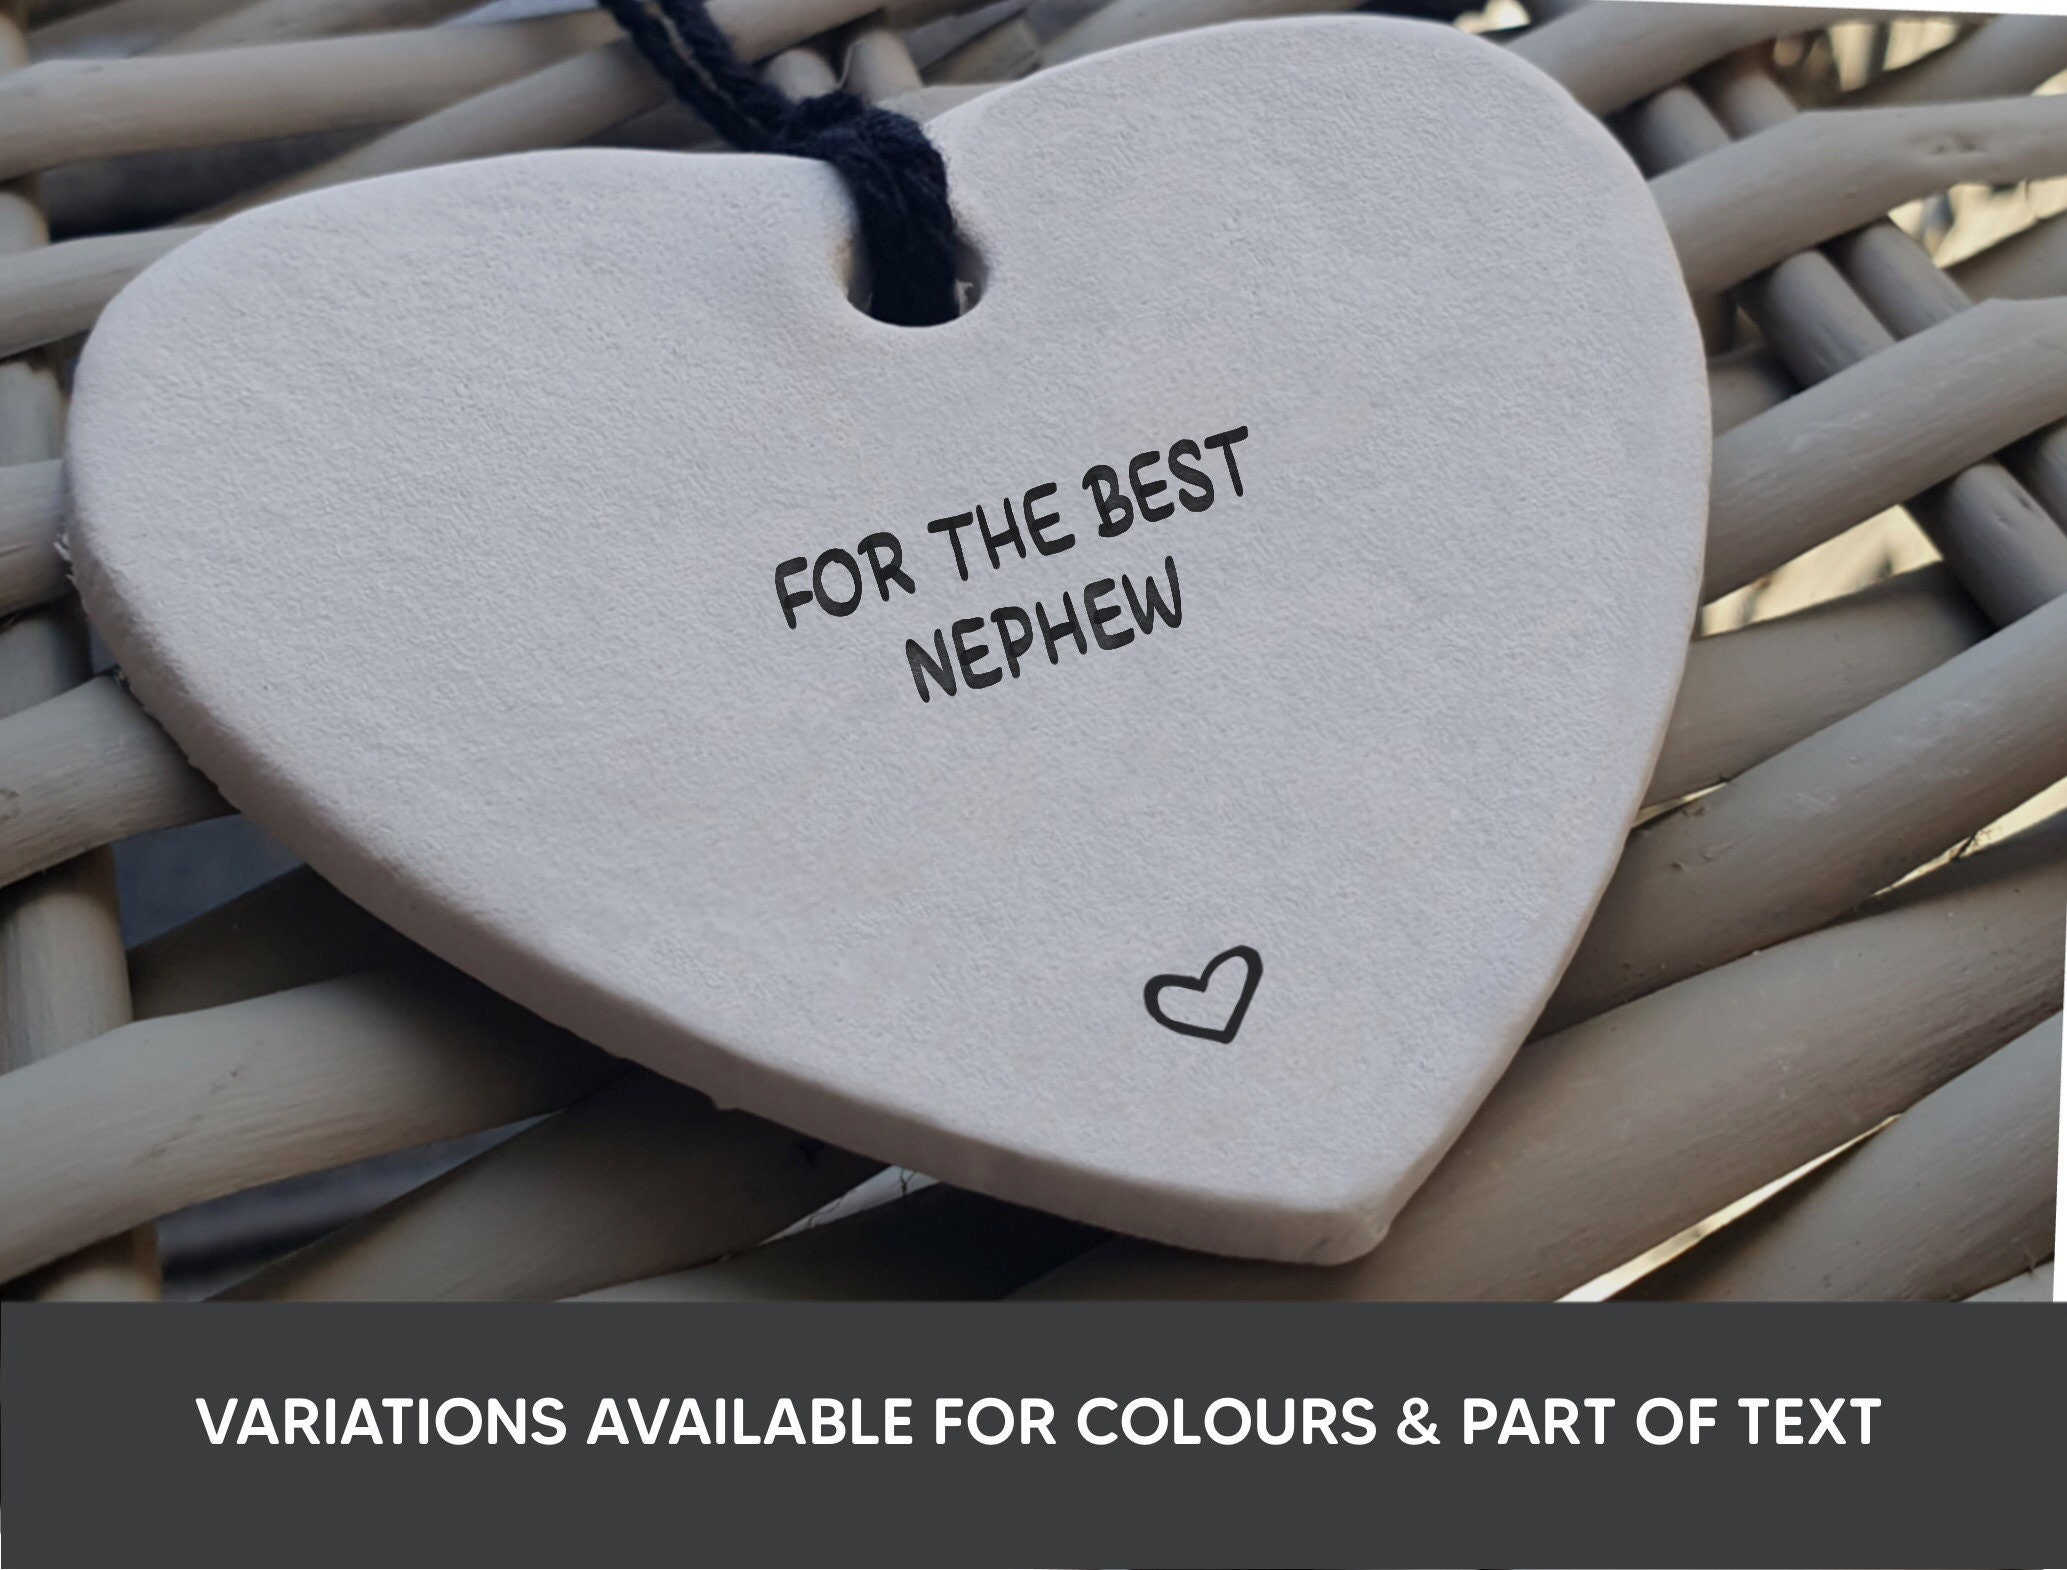 Neffe Geschenk personalisierte Ton Herz Danke Geschenk | Etsy